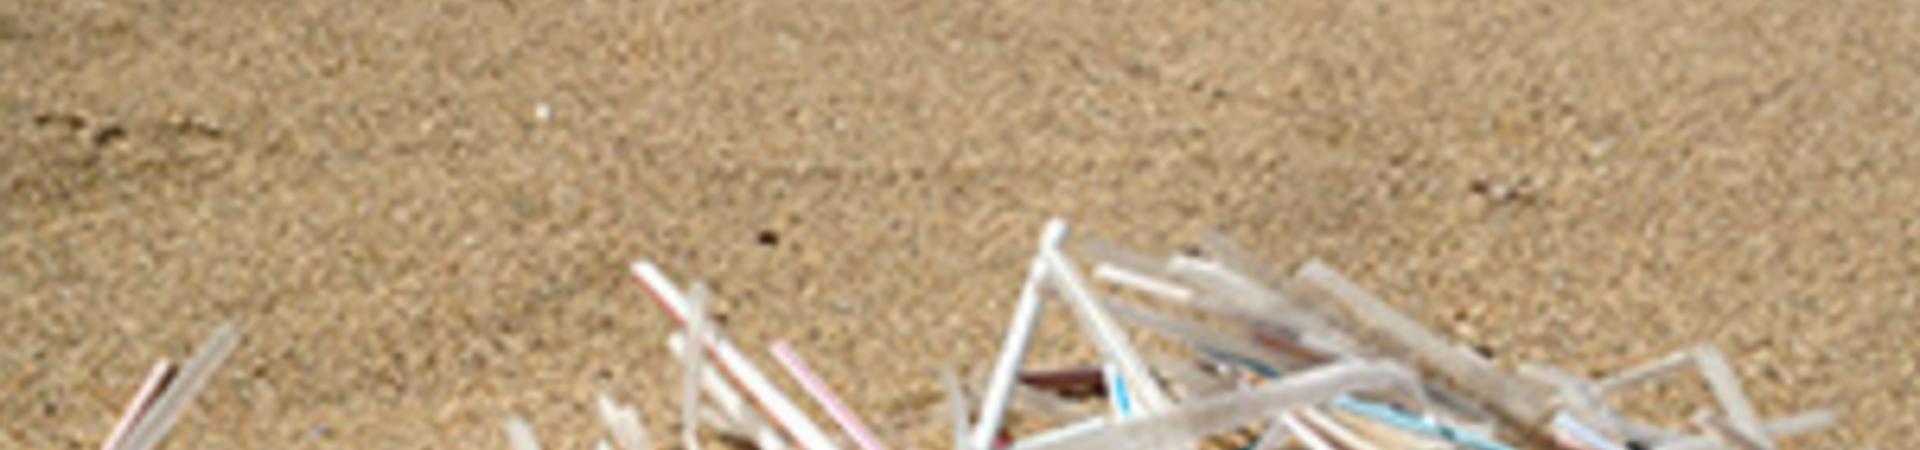 Banner - Plastic Pollution Coalition